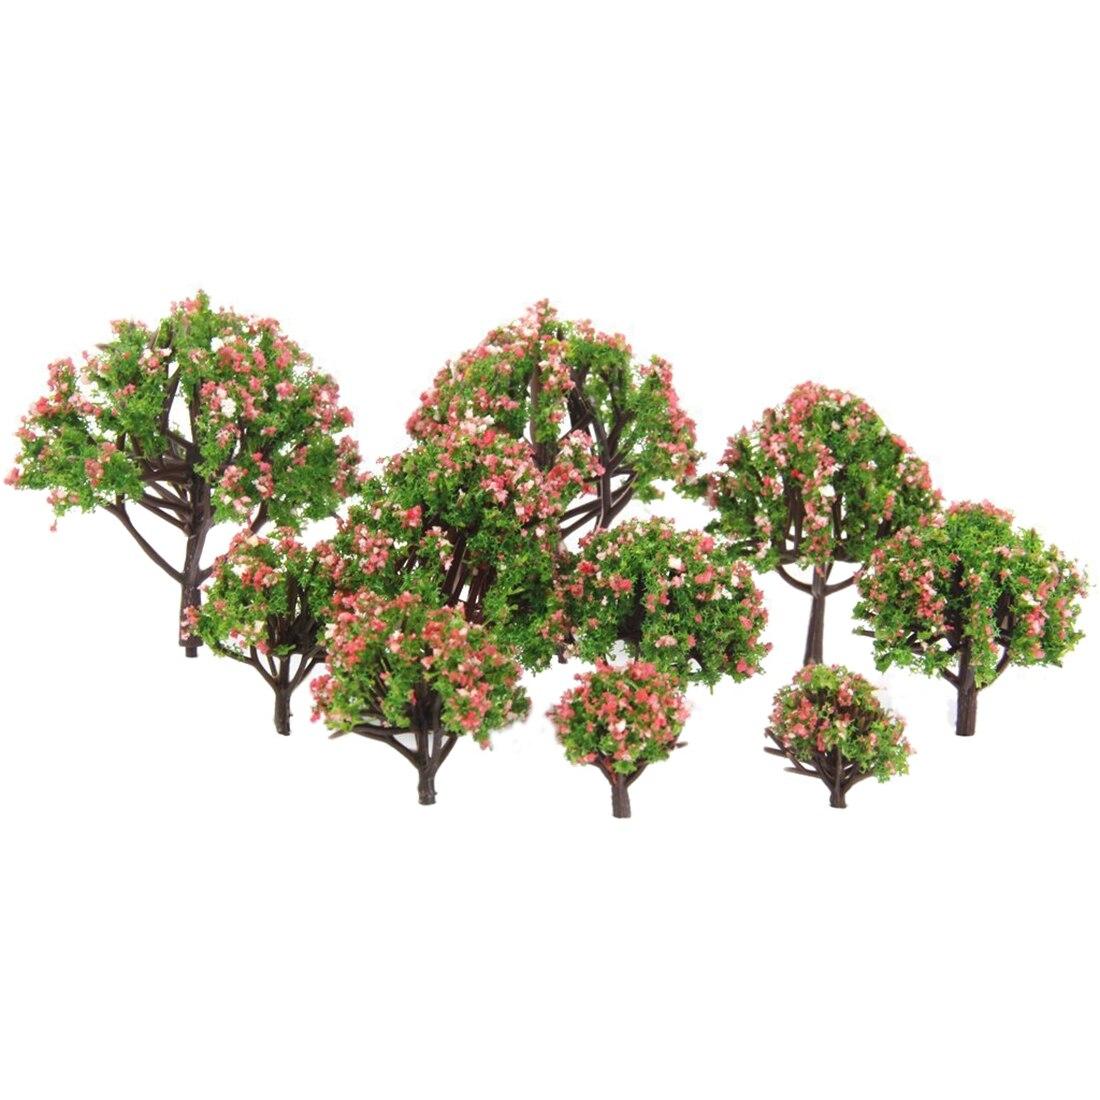 2018 New Plastic peach trees model railway railway landscape scale 1:75 - 1: 500